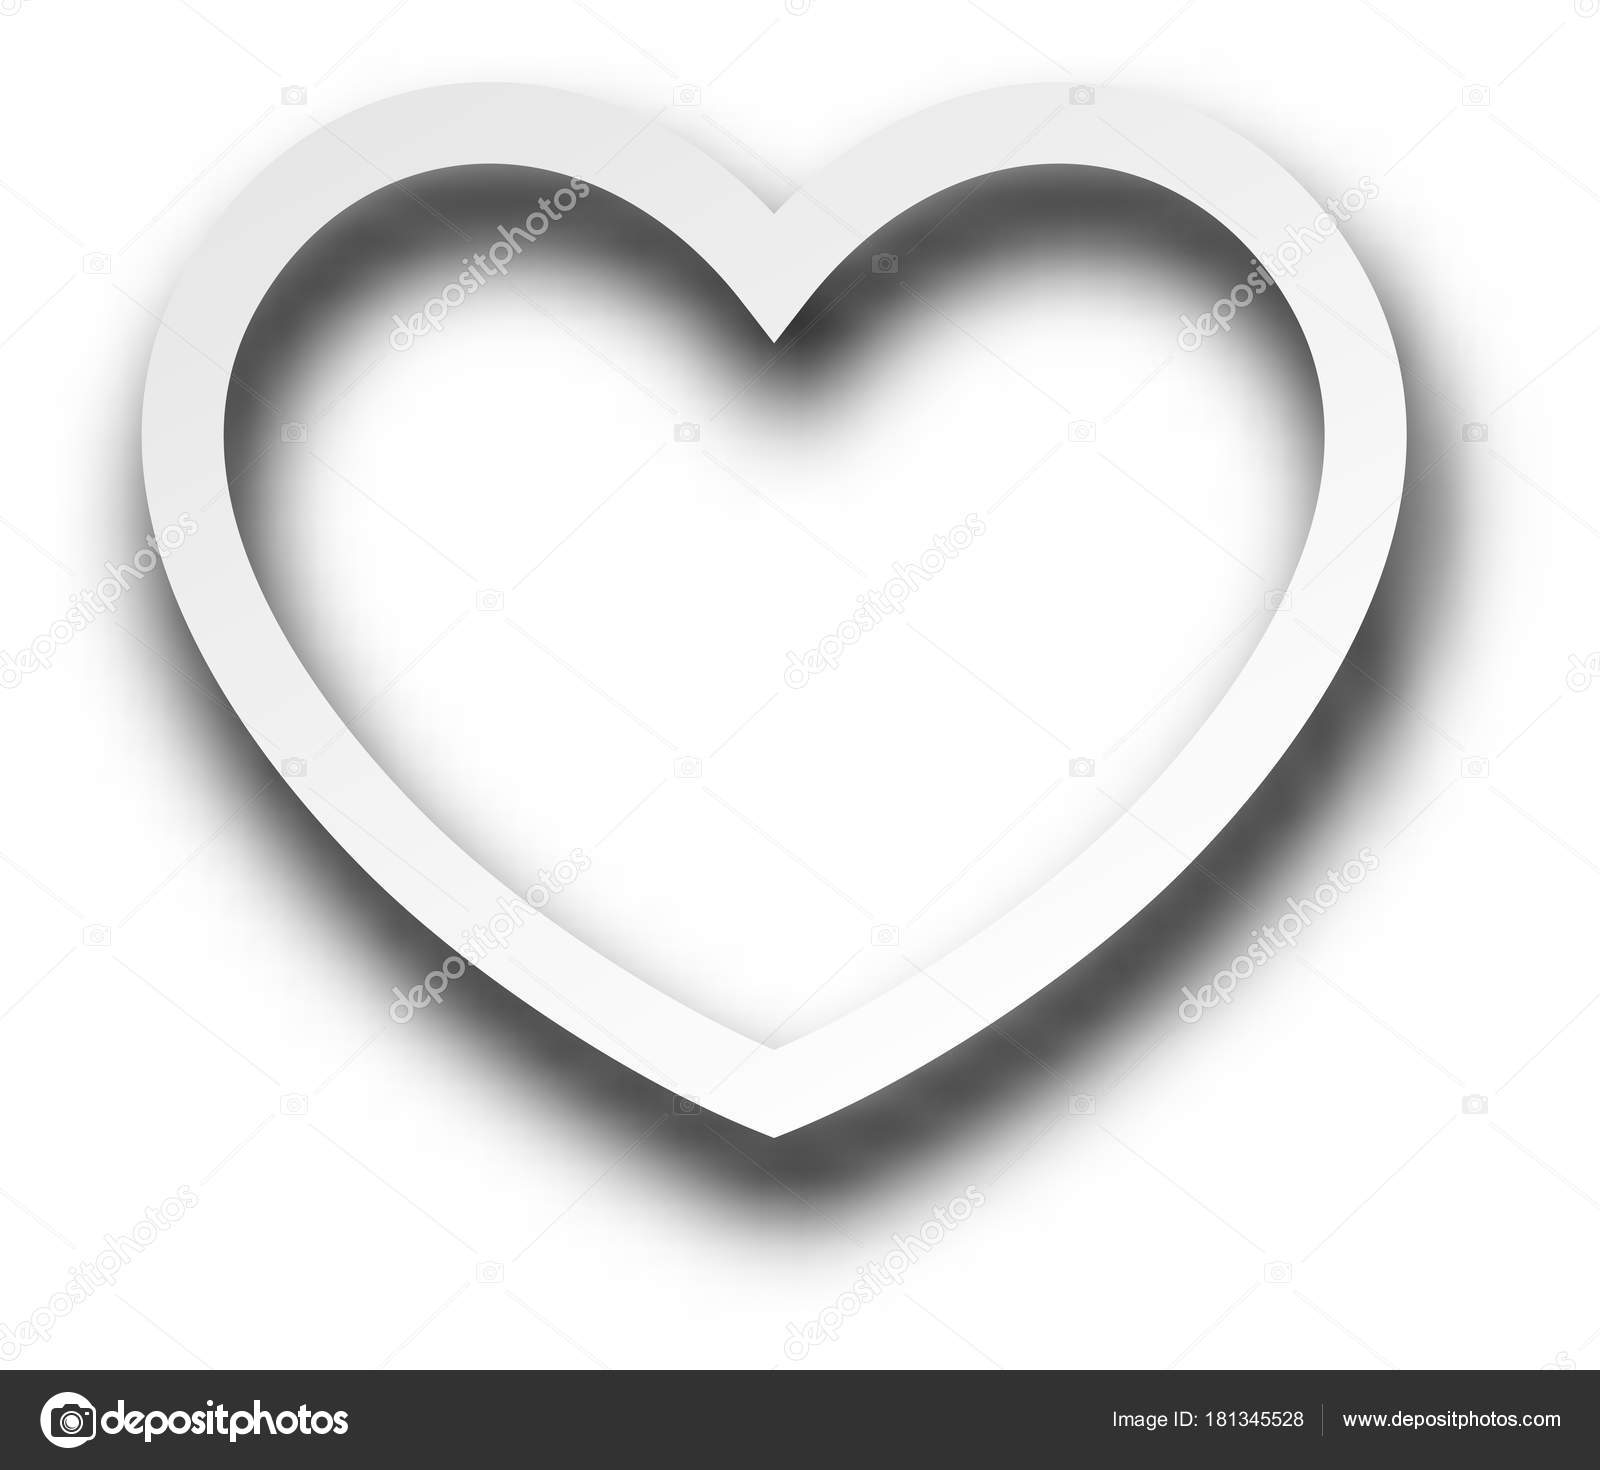 Valentines Heart Template Hooperswar Exaple Resume And